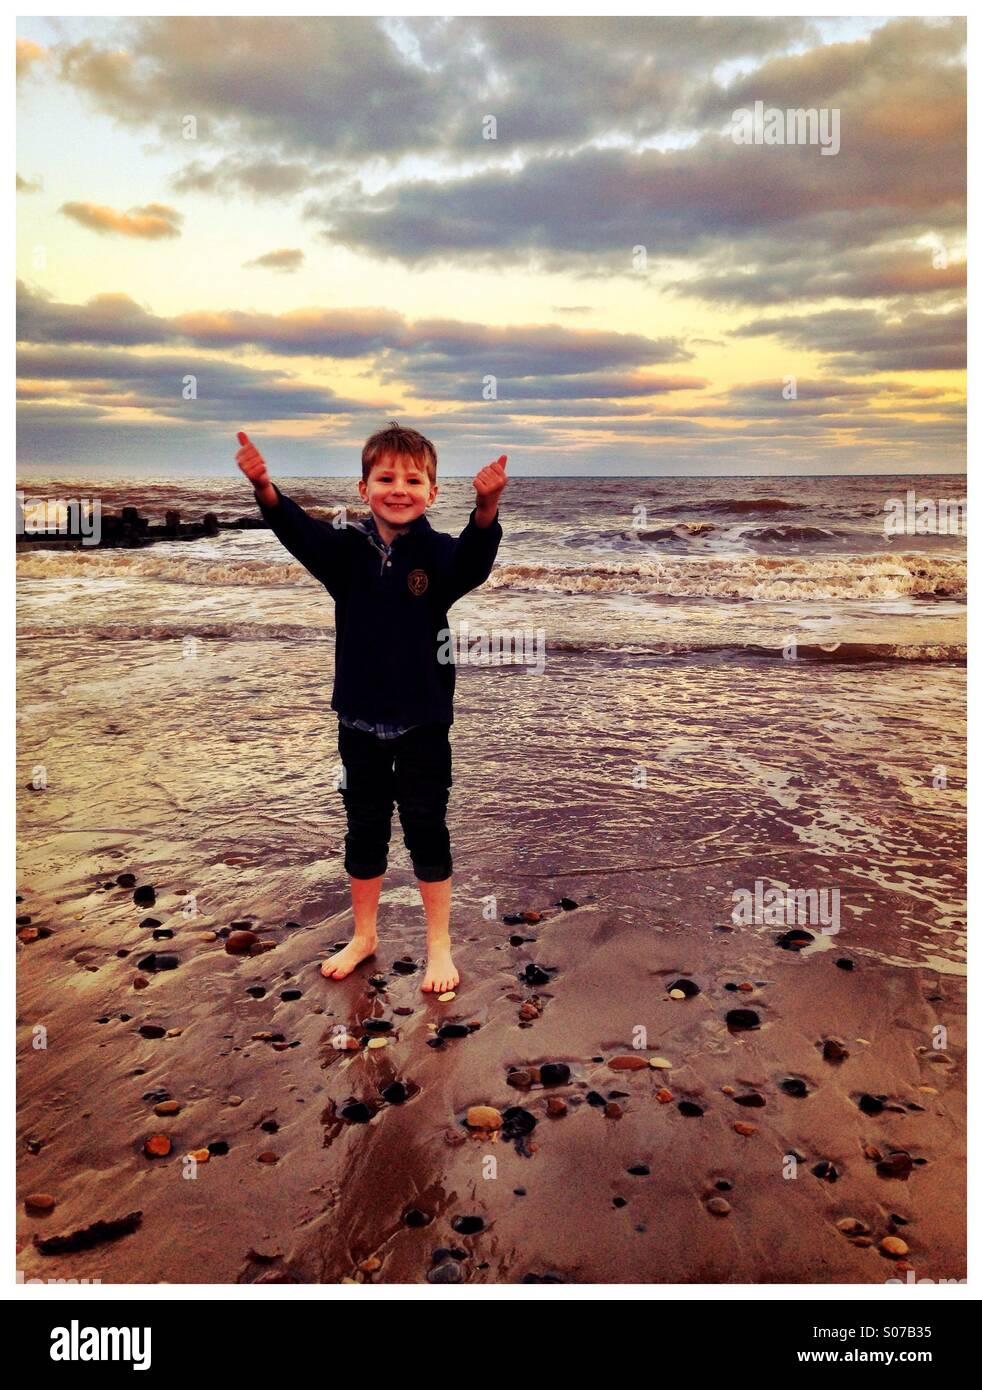 Big Sky, großer Strand, kleiner Junge. Hornsea. Stockbild